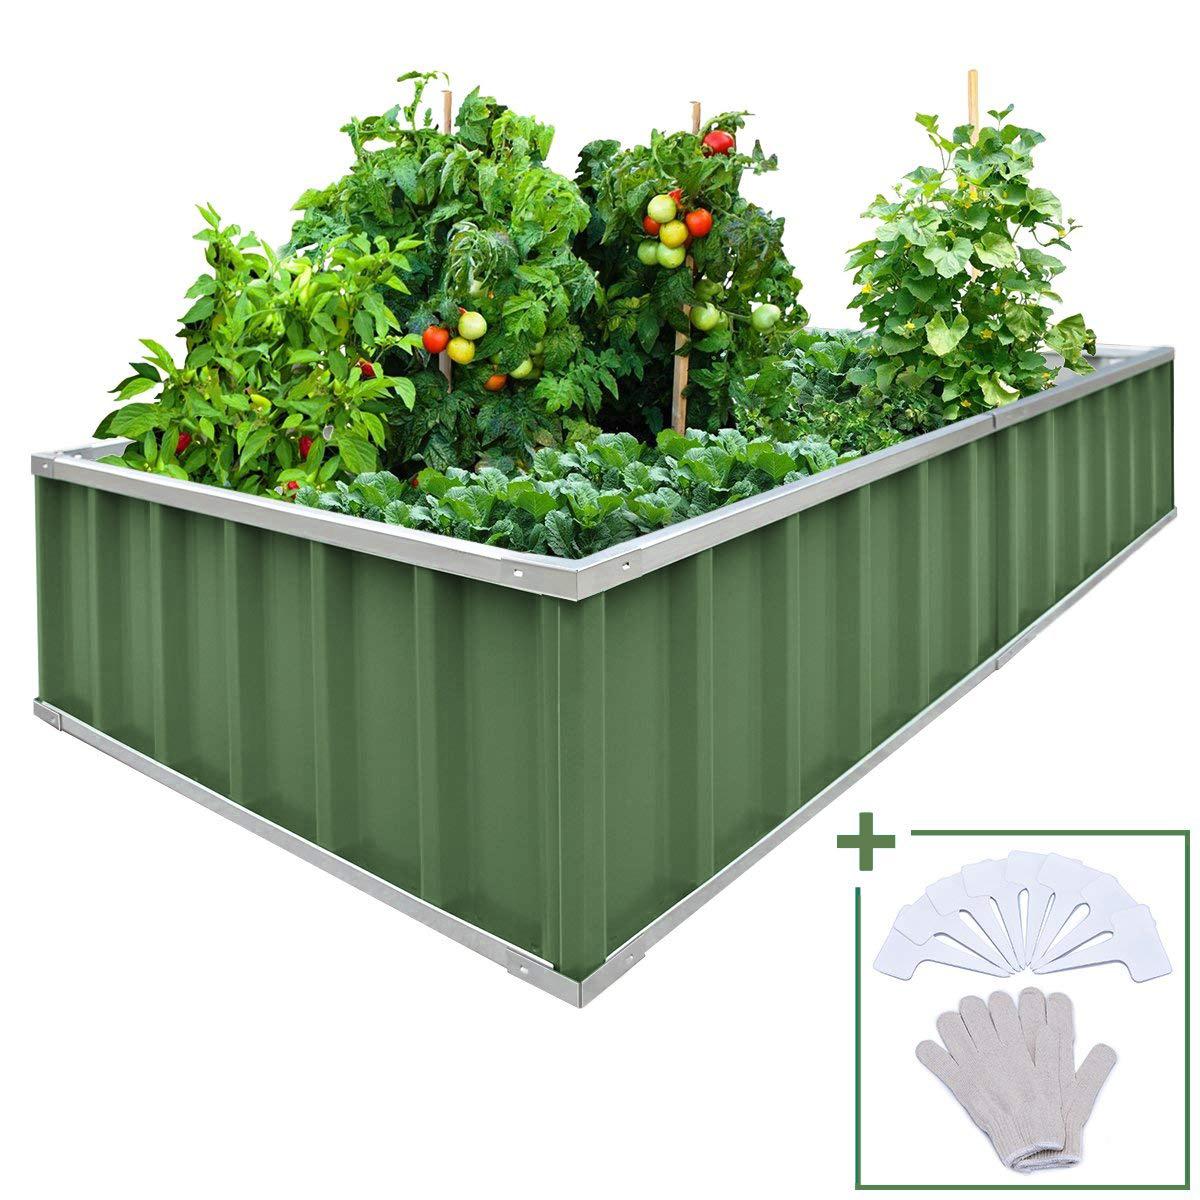 68 X35 5 Raised Garden Bed Planter Kit Box 8pcs T Type